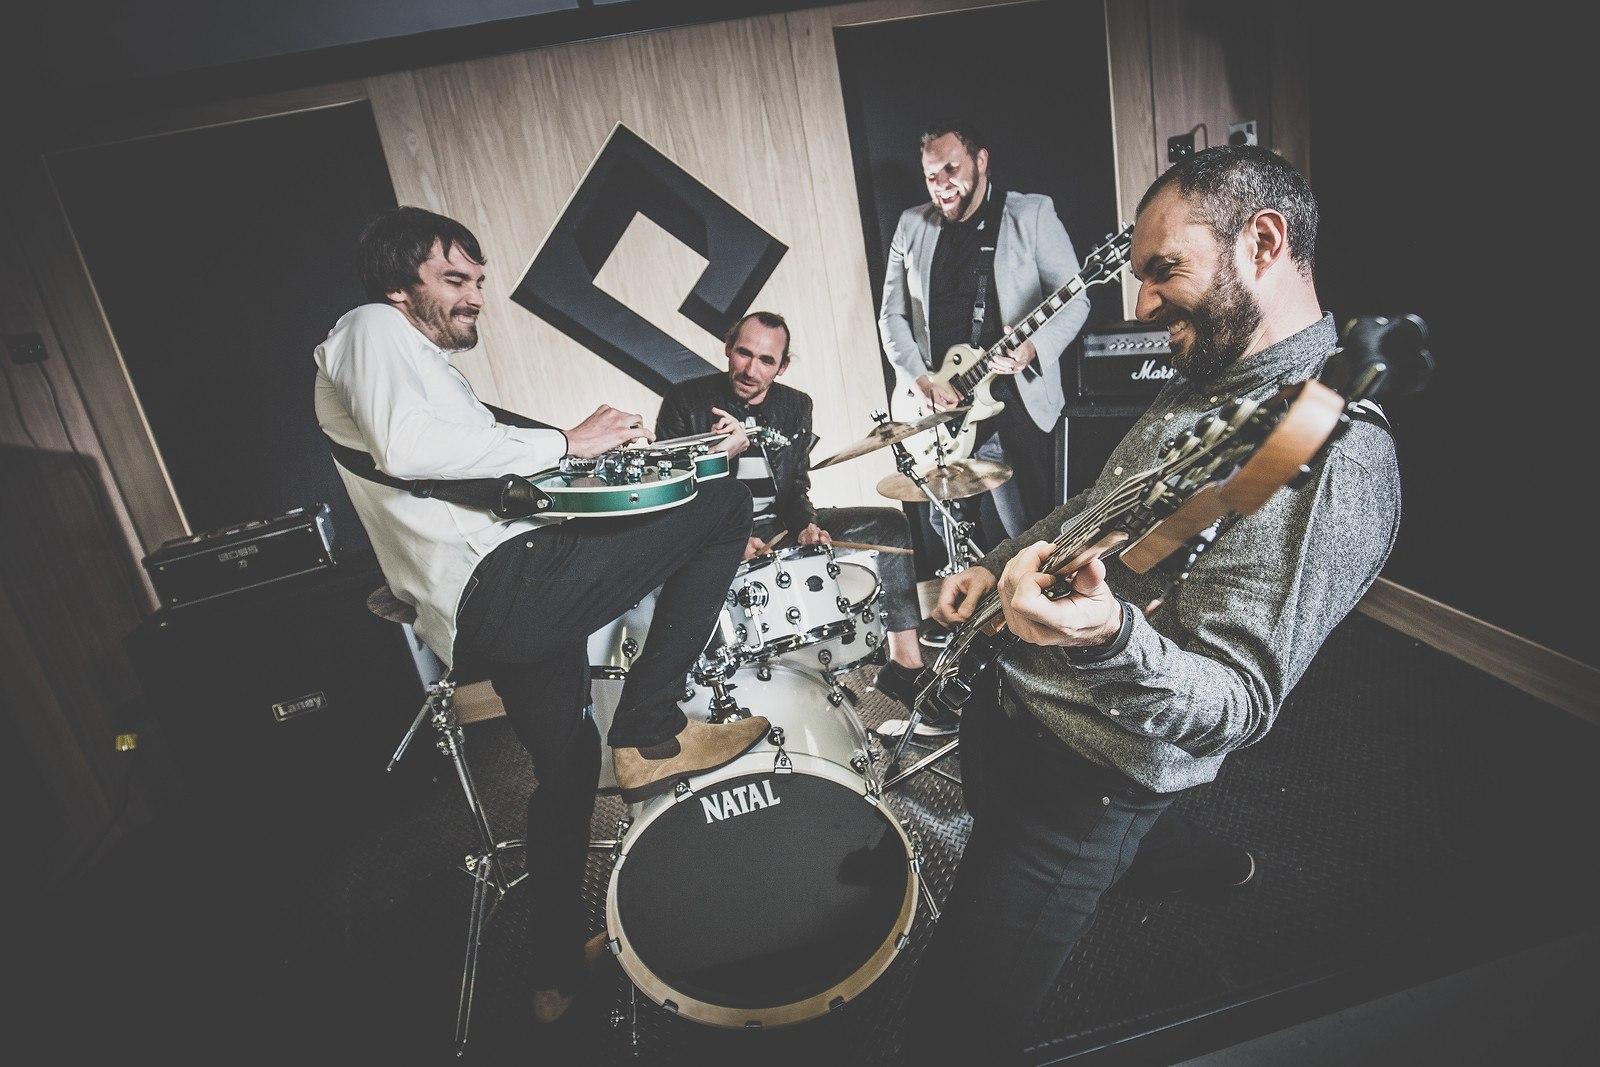 Promo Ocean City Function Band Devon